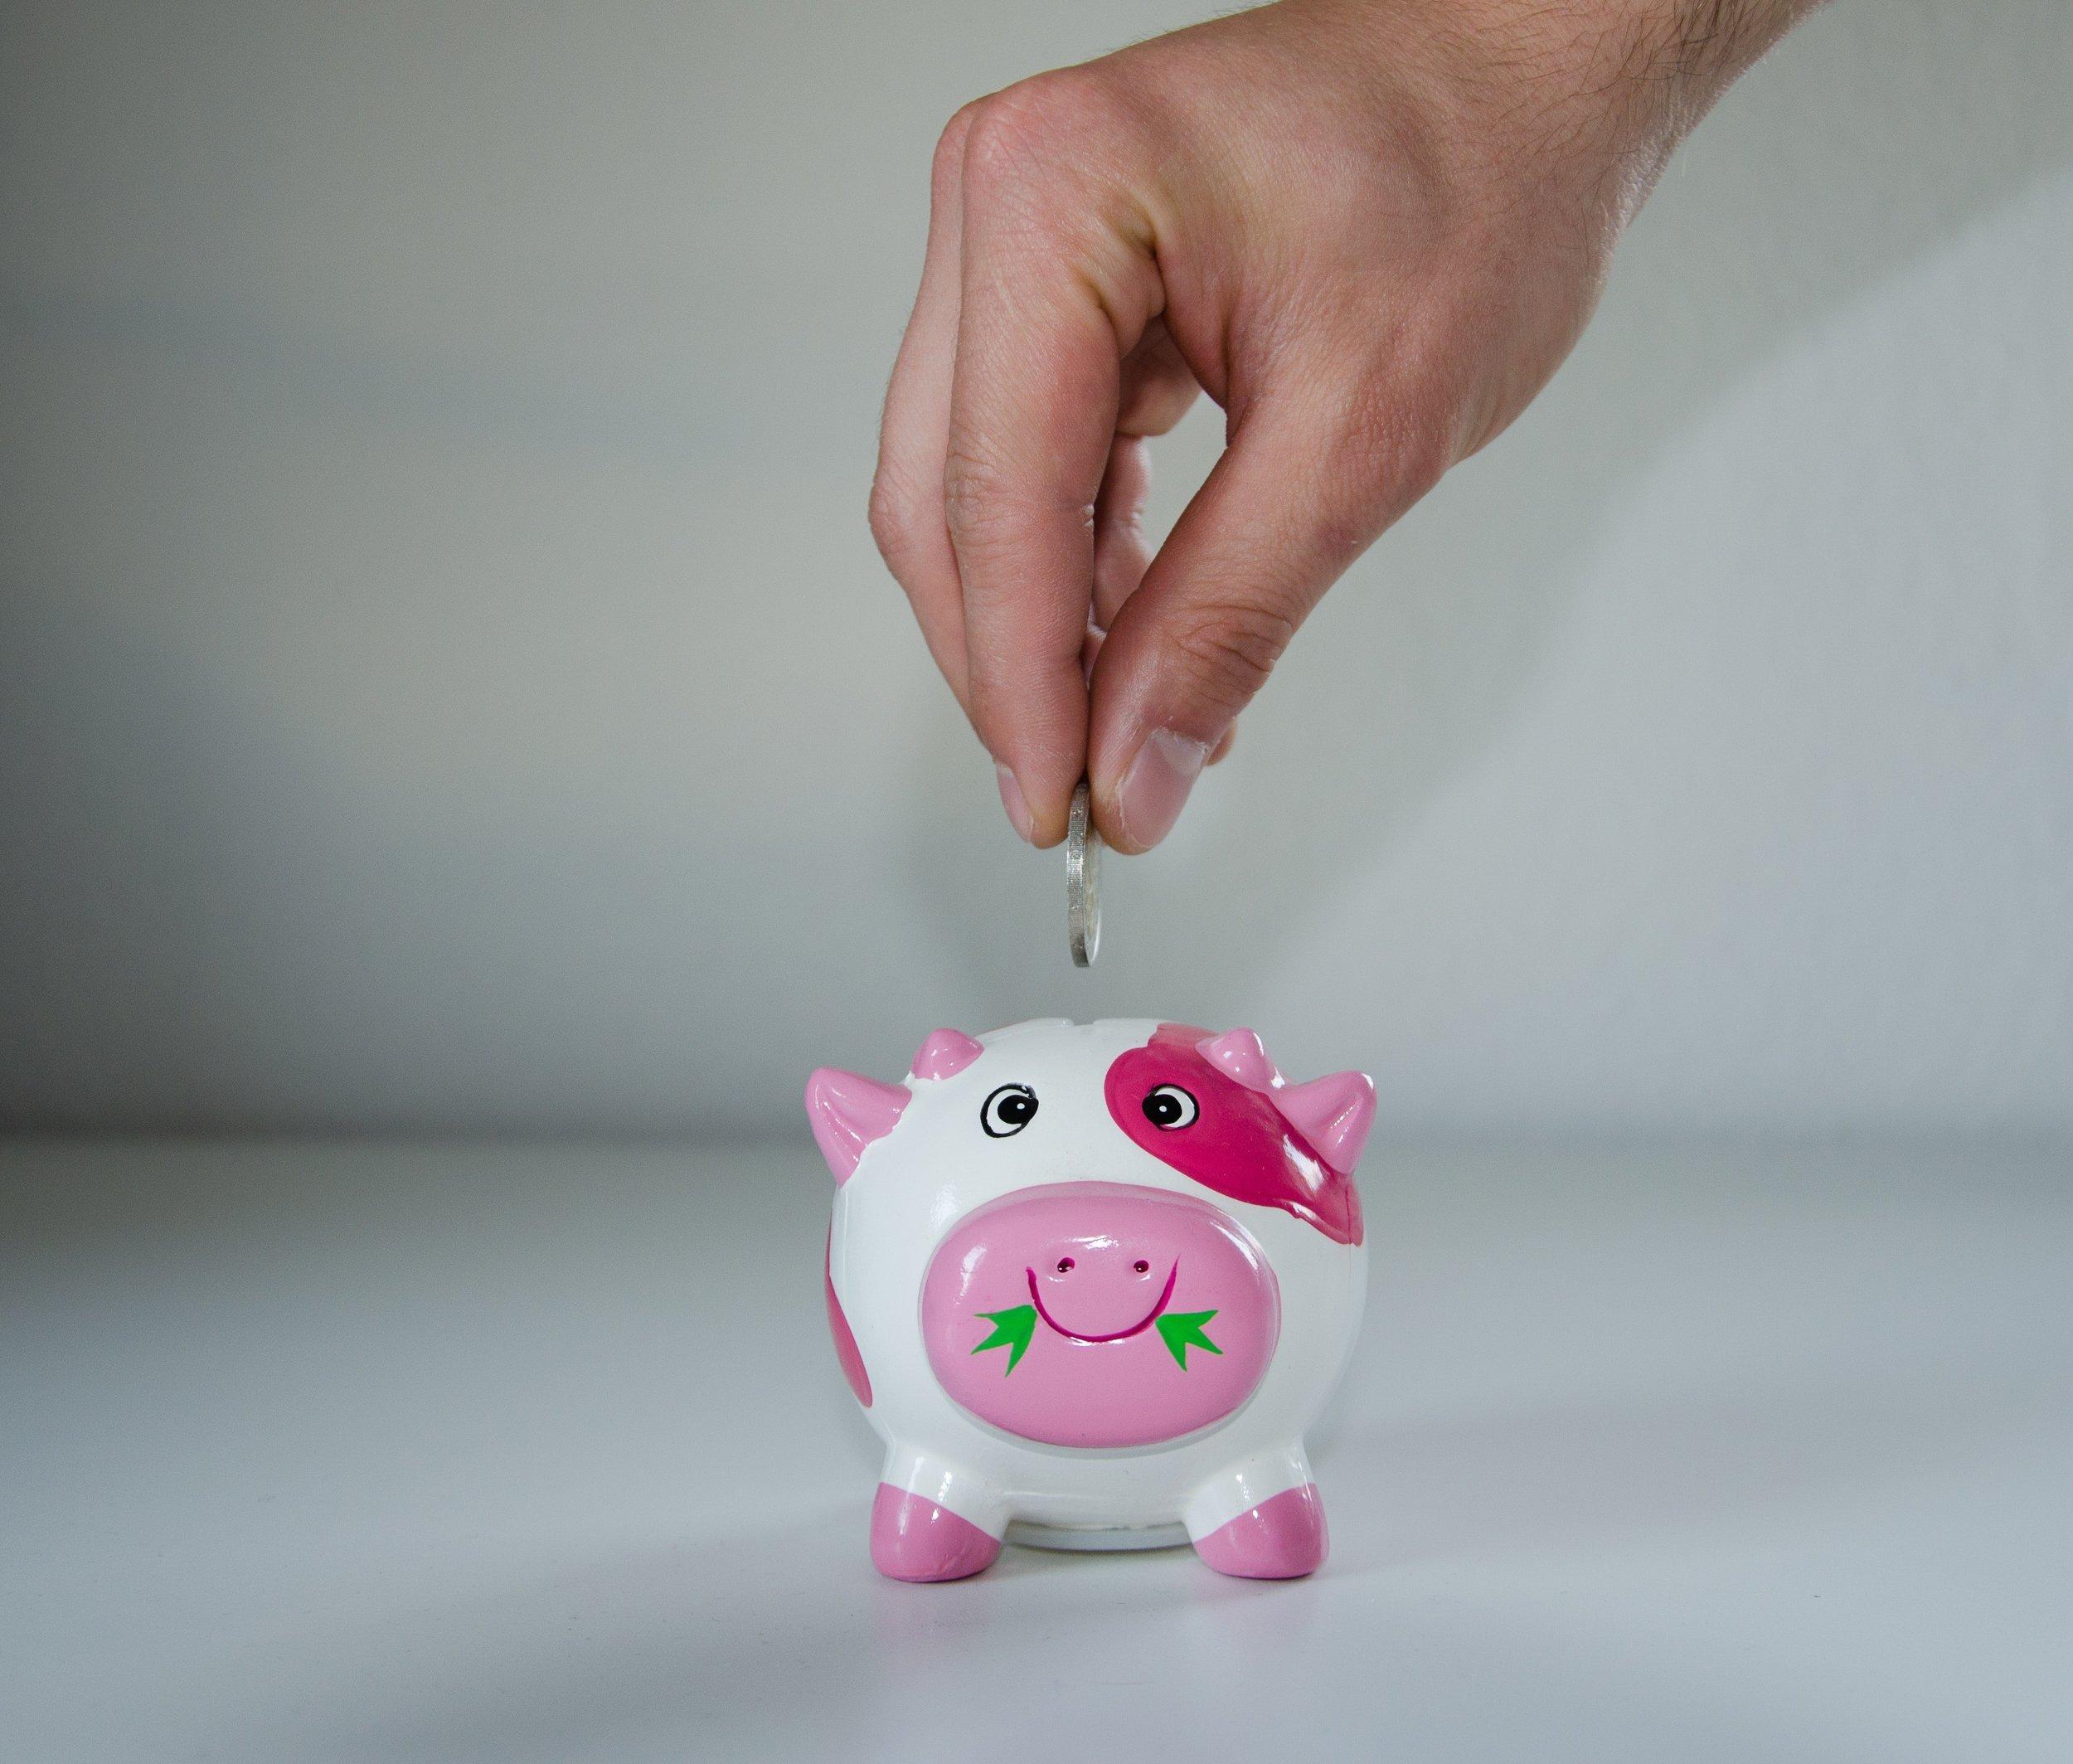 coin-hand-money-221534.jpg